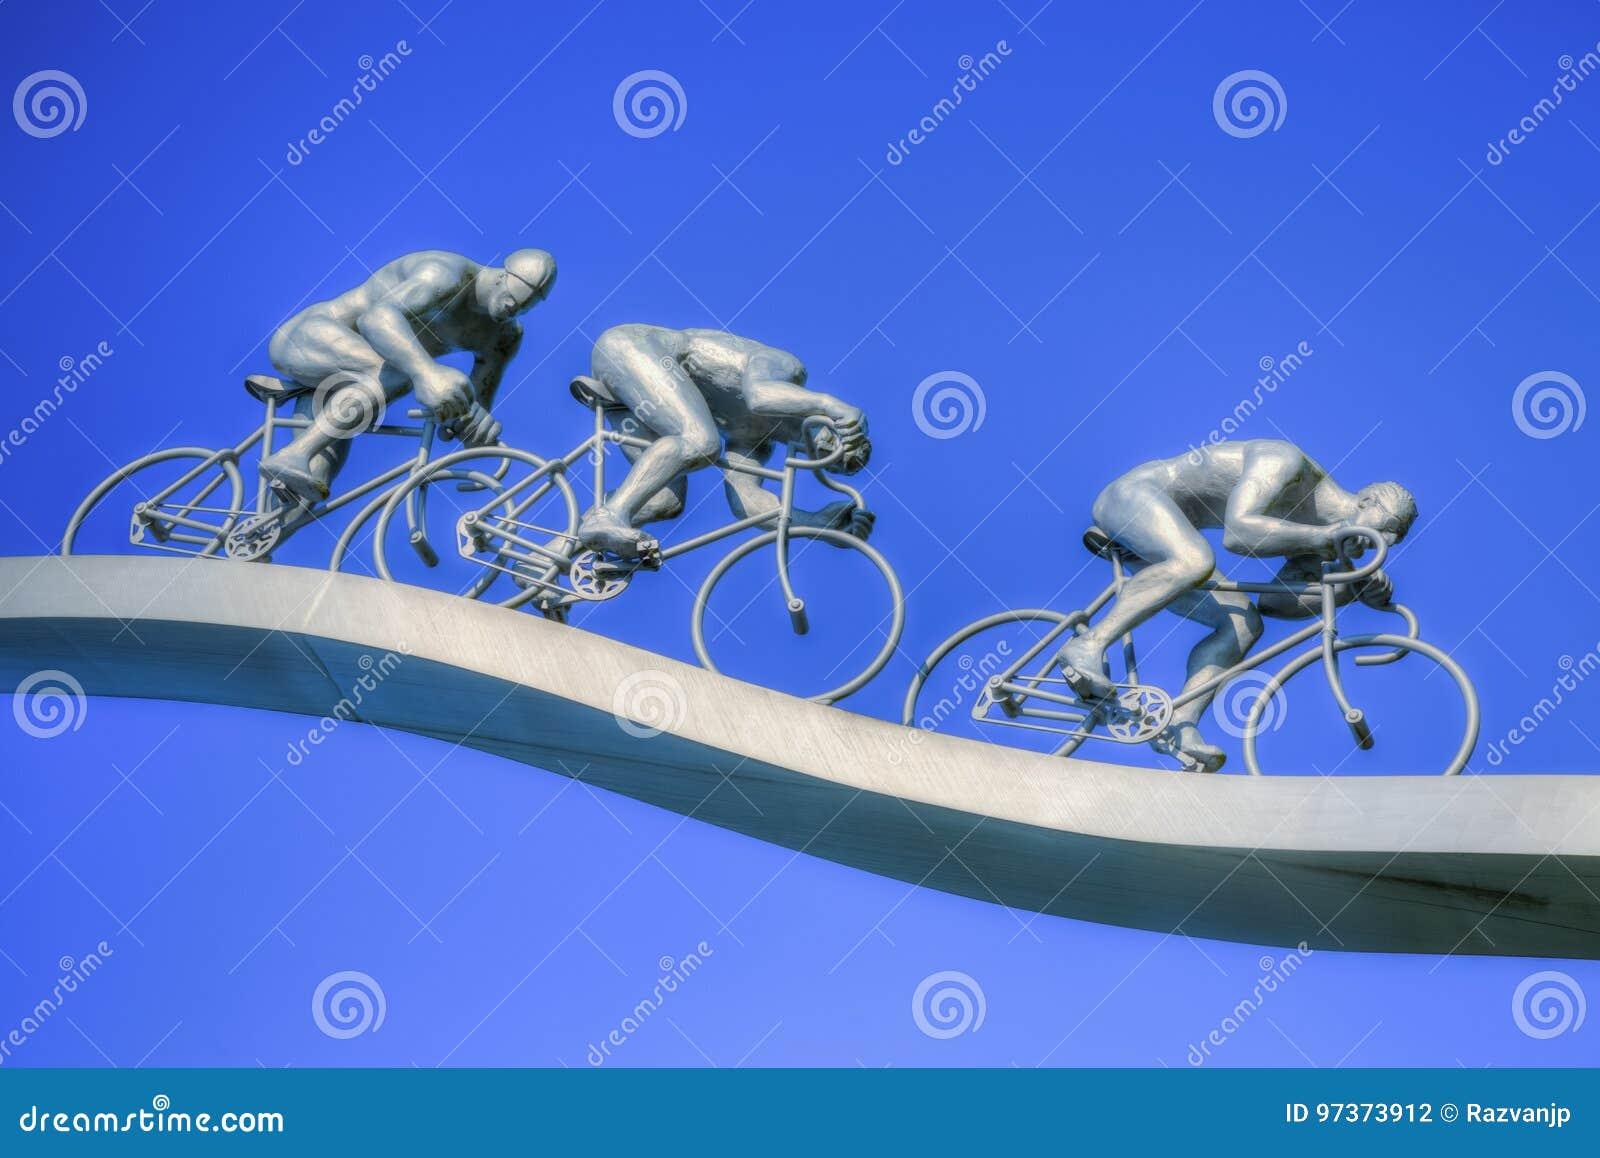 † Tour de France ausführlich Pyreneesâ€- Skulptur